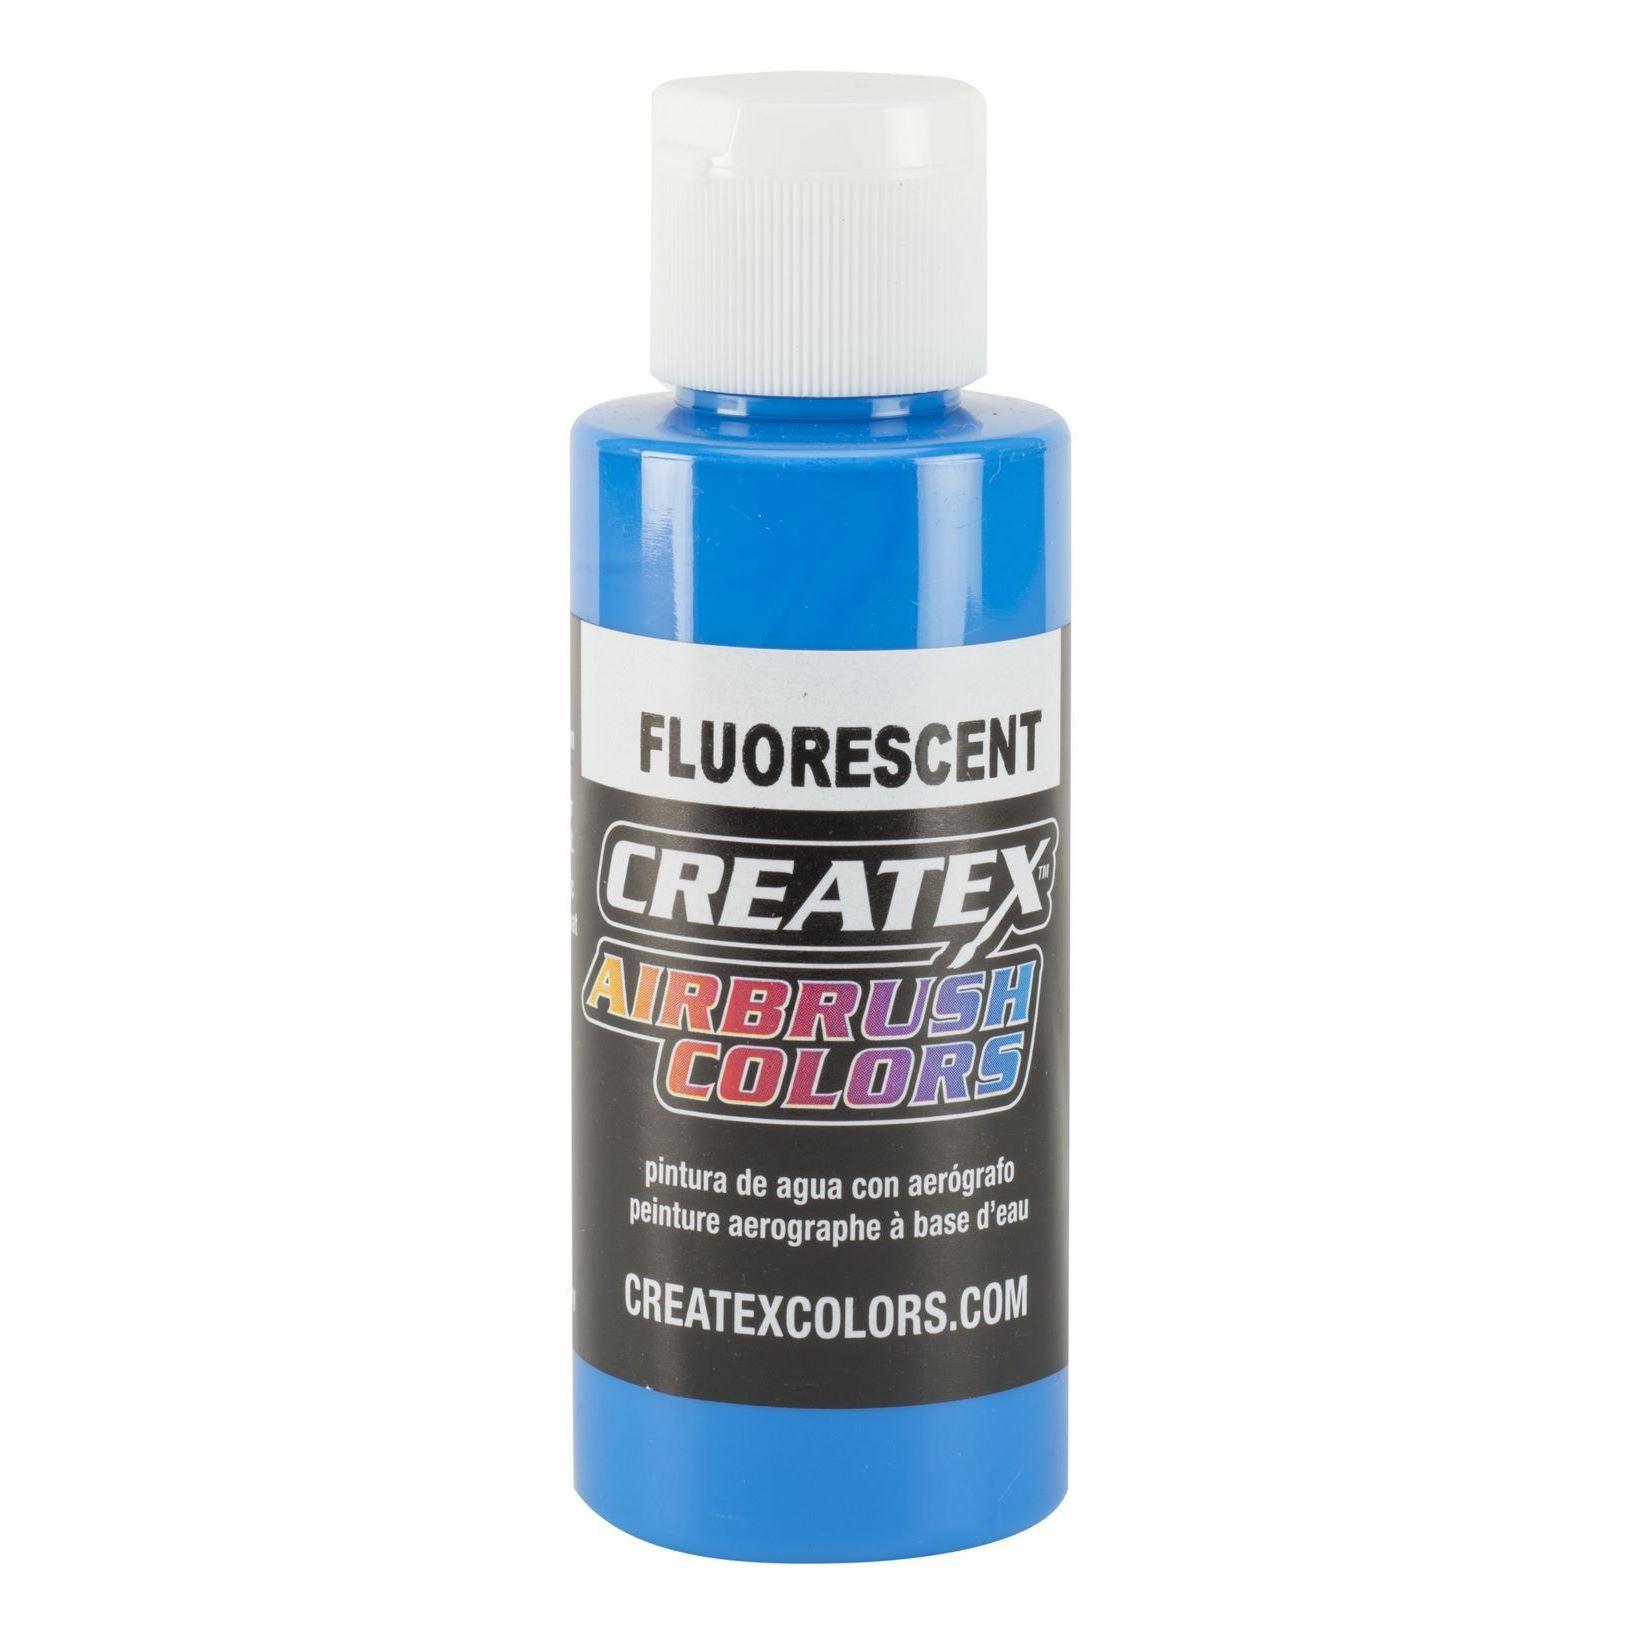 fluorescent blue Createx Airbrush Colors Farbe 60ml 11 5403 Createx